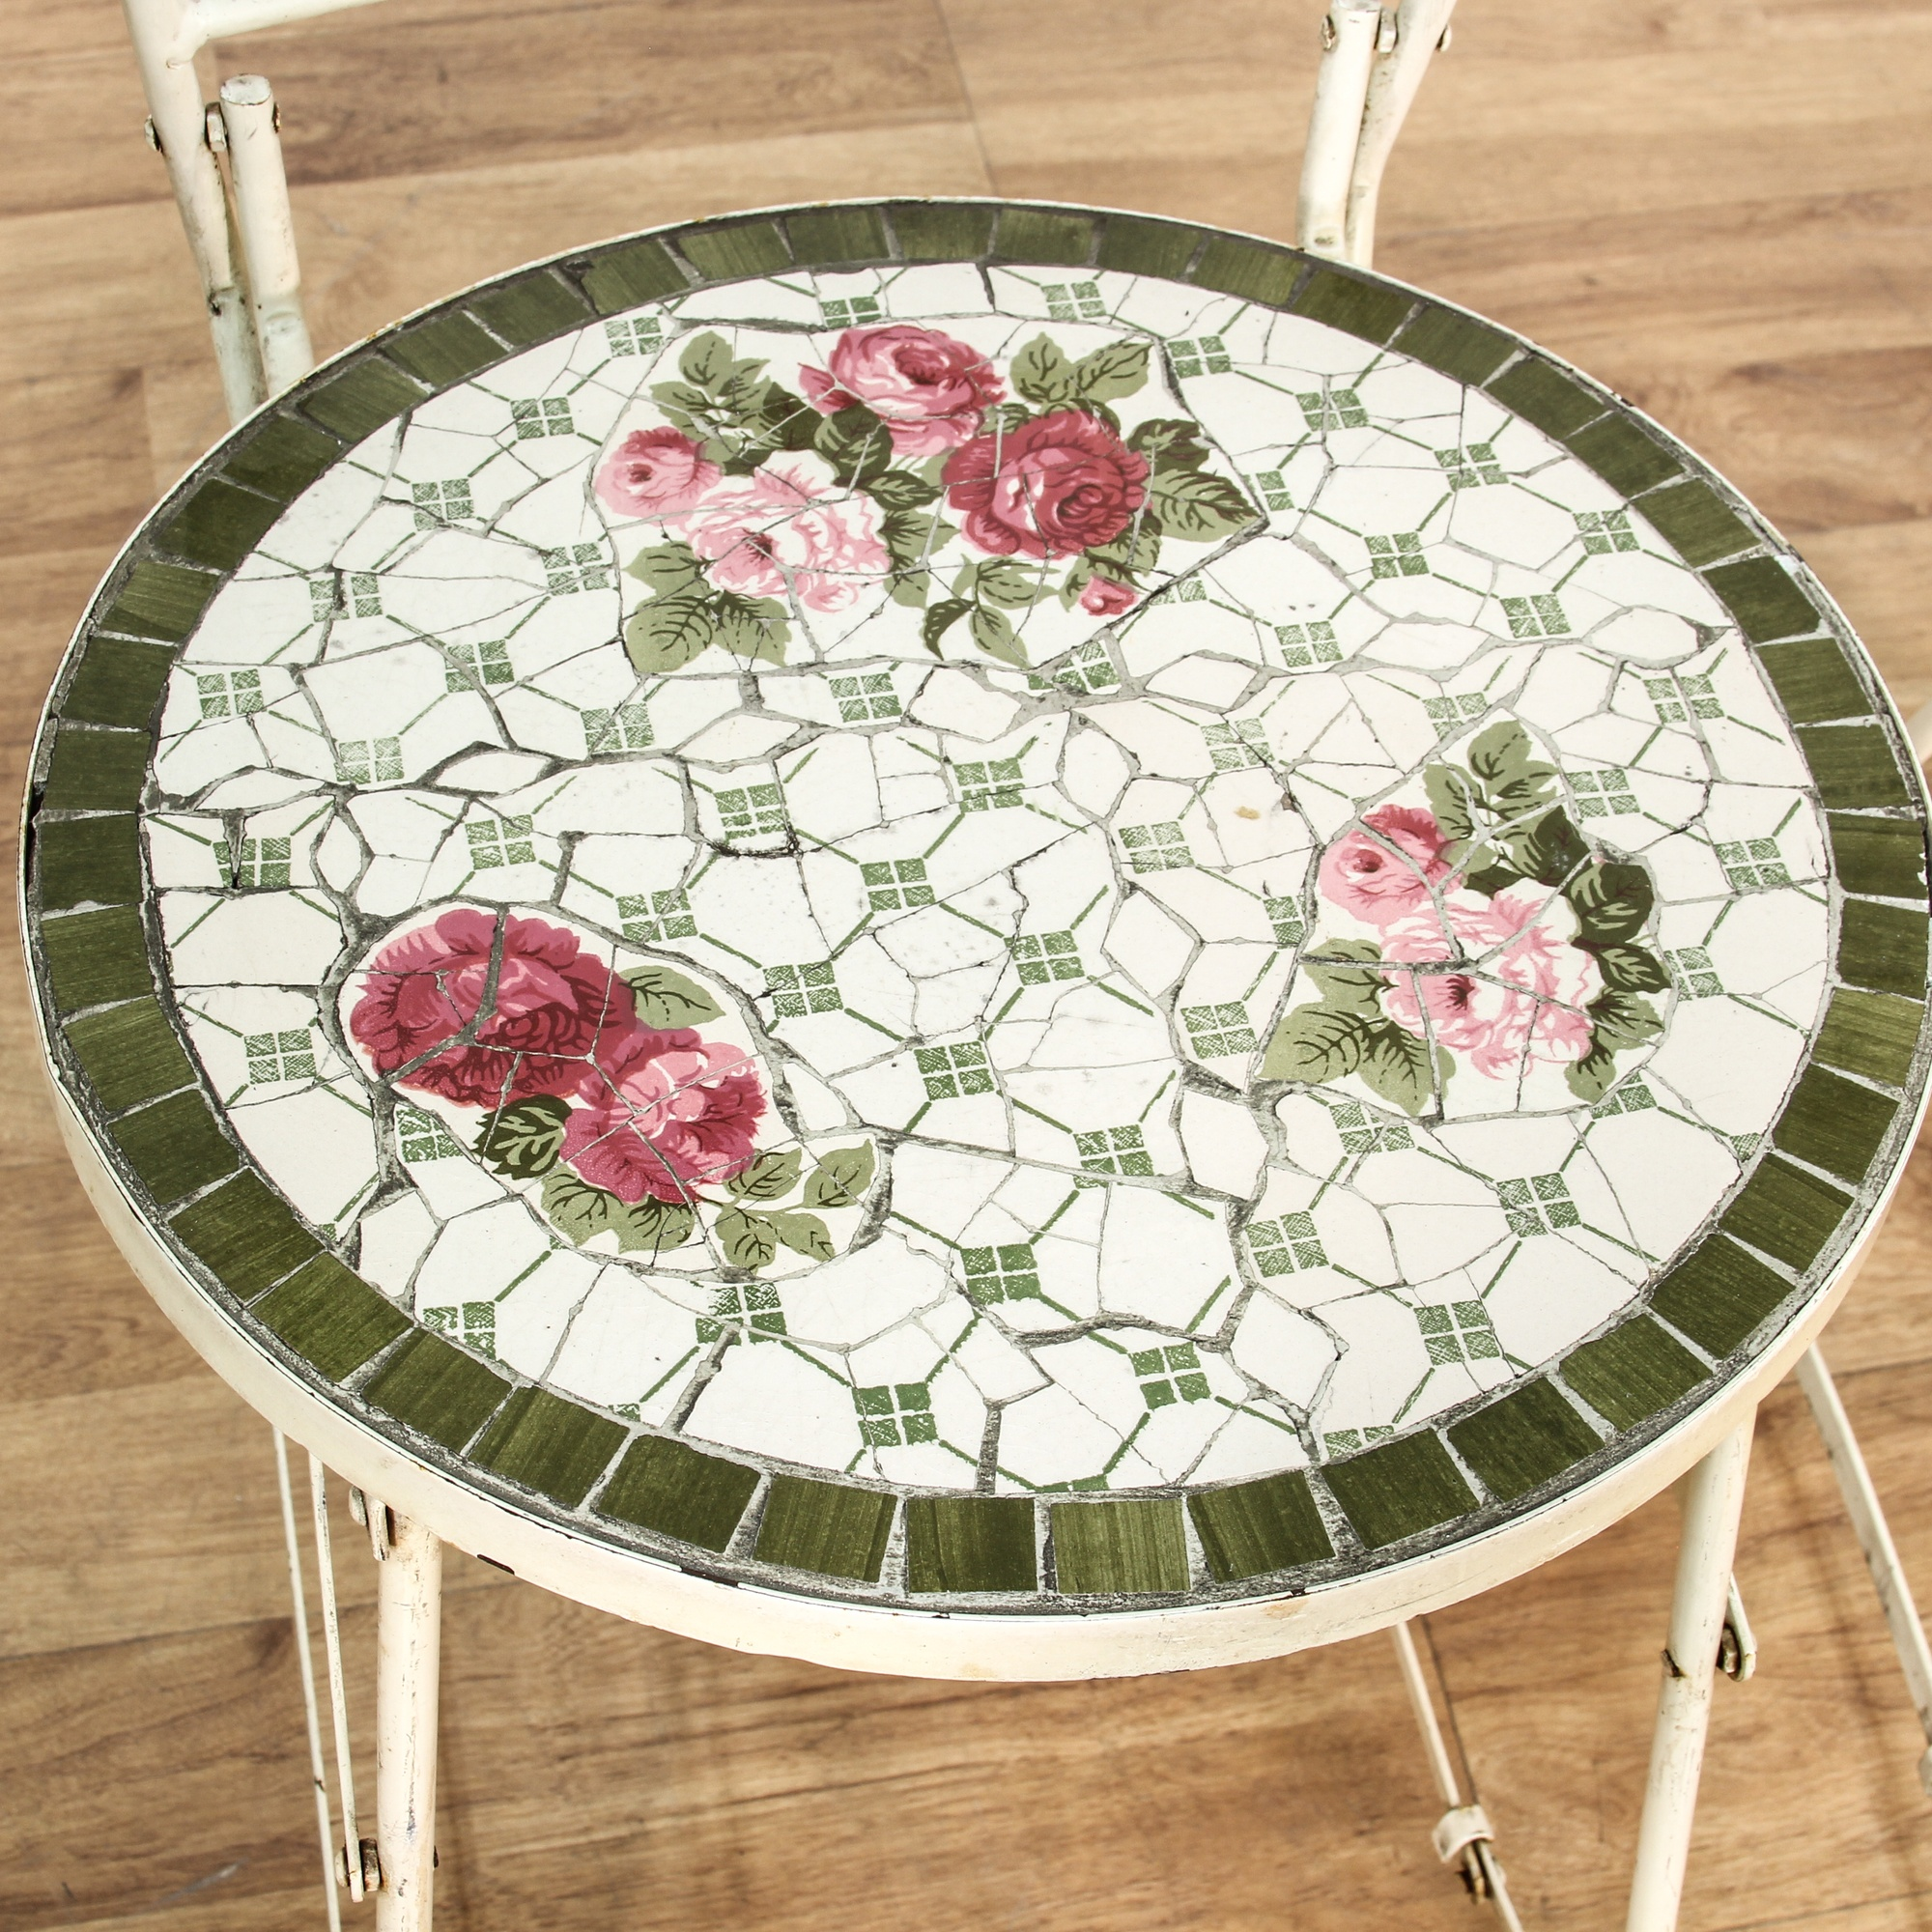 Pair Of Shabby Chic Folding Mosaic Seat Barstools